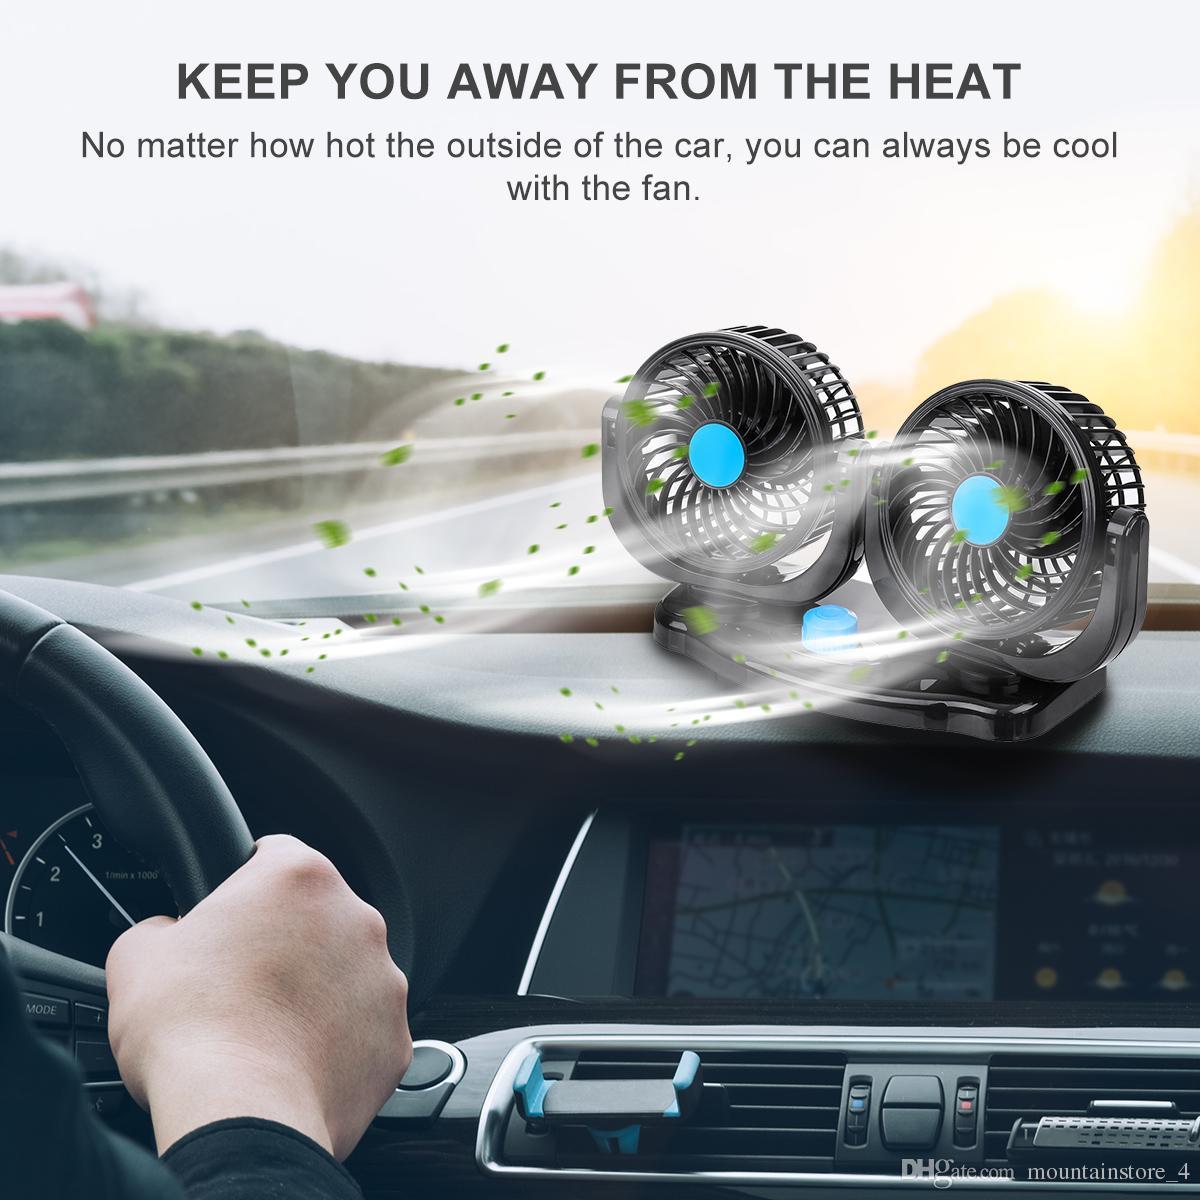 hight resolution of compre 12 v 24 v 360 grados all round ajustable auto auto aire cooling dual head fan bajo ruido ruido auto cooling air fan car accessor a 18 63 del